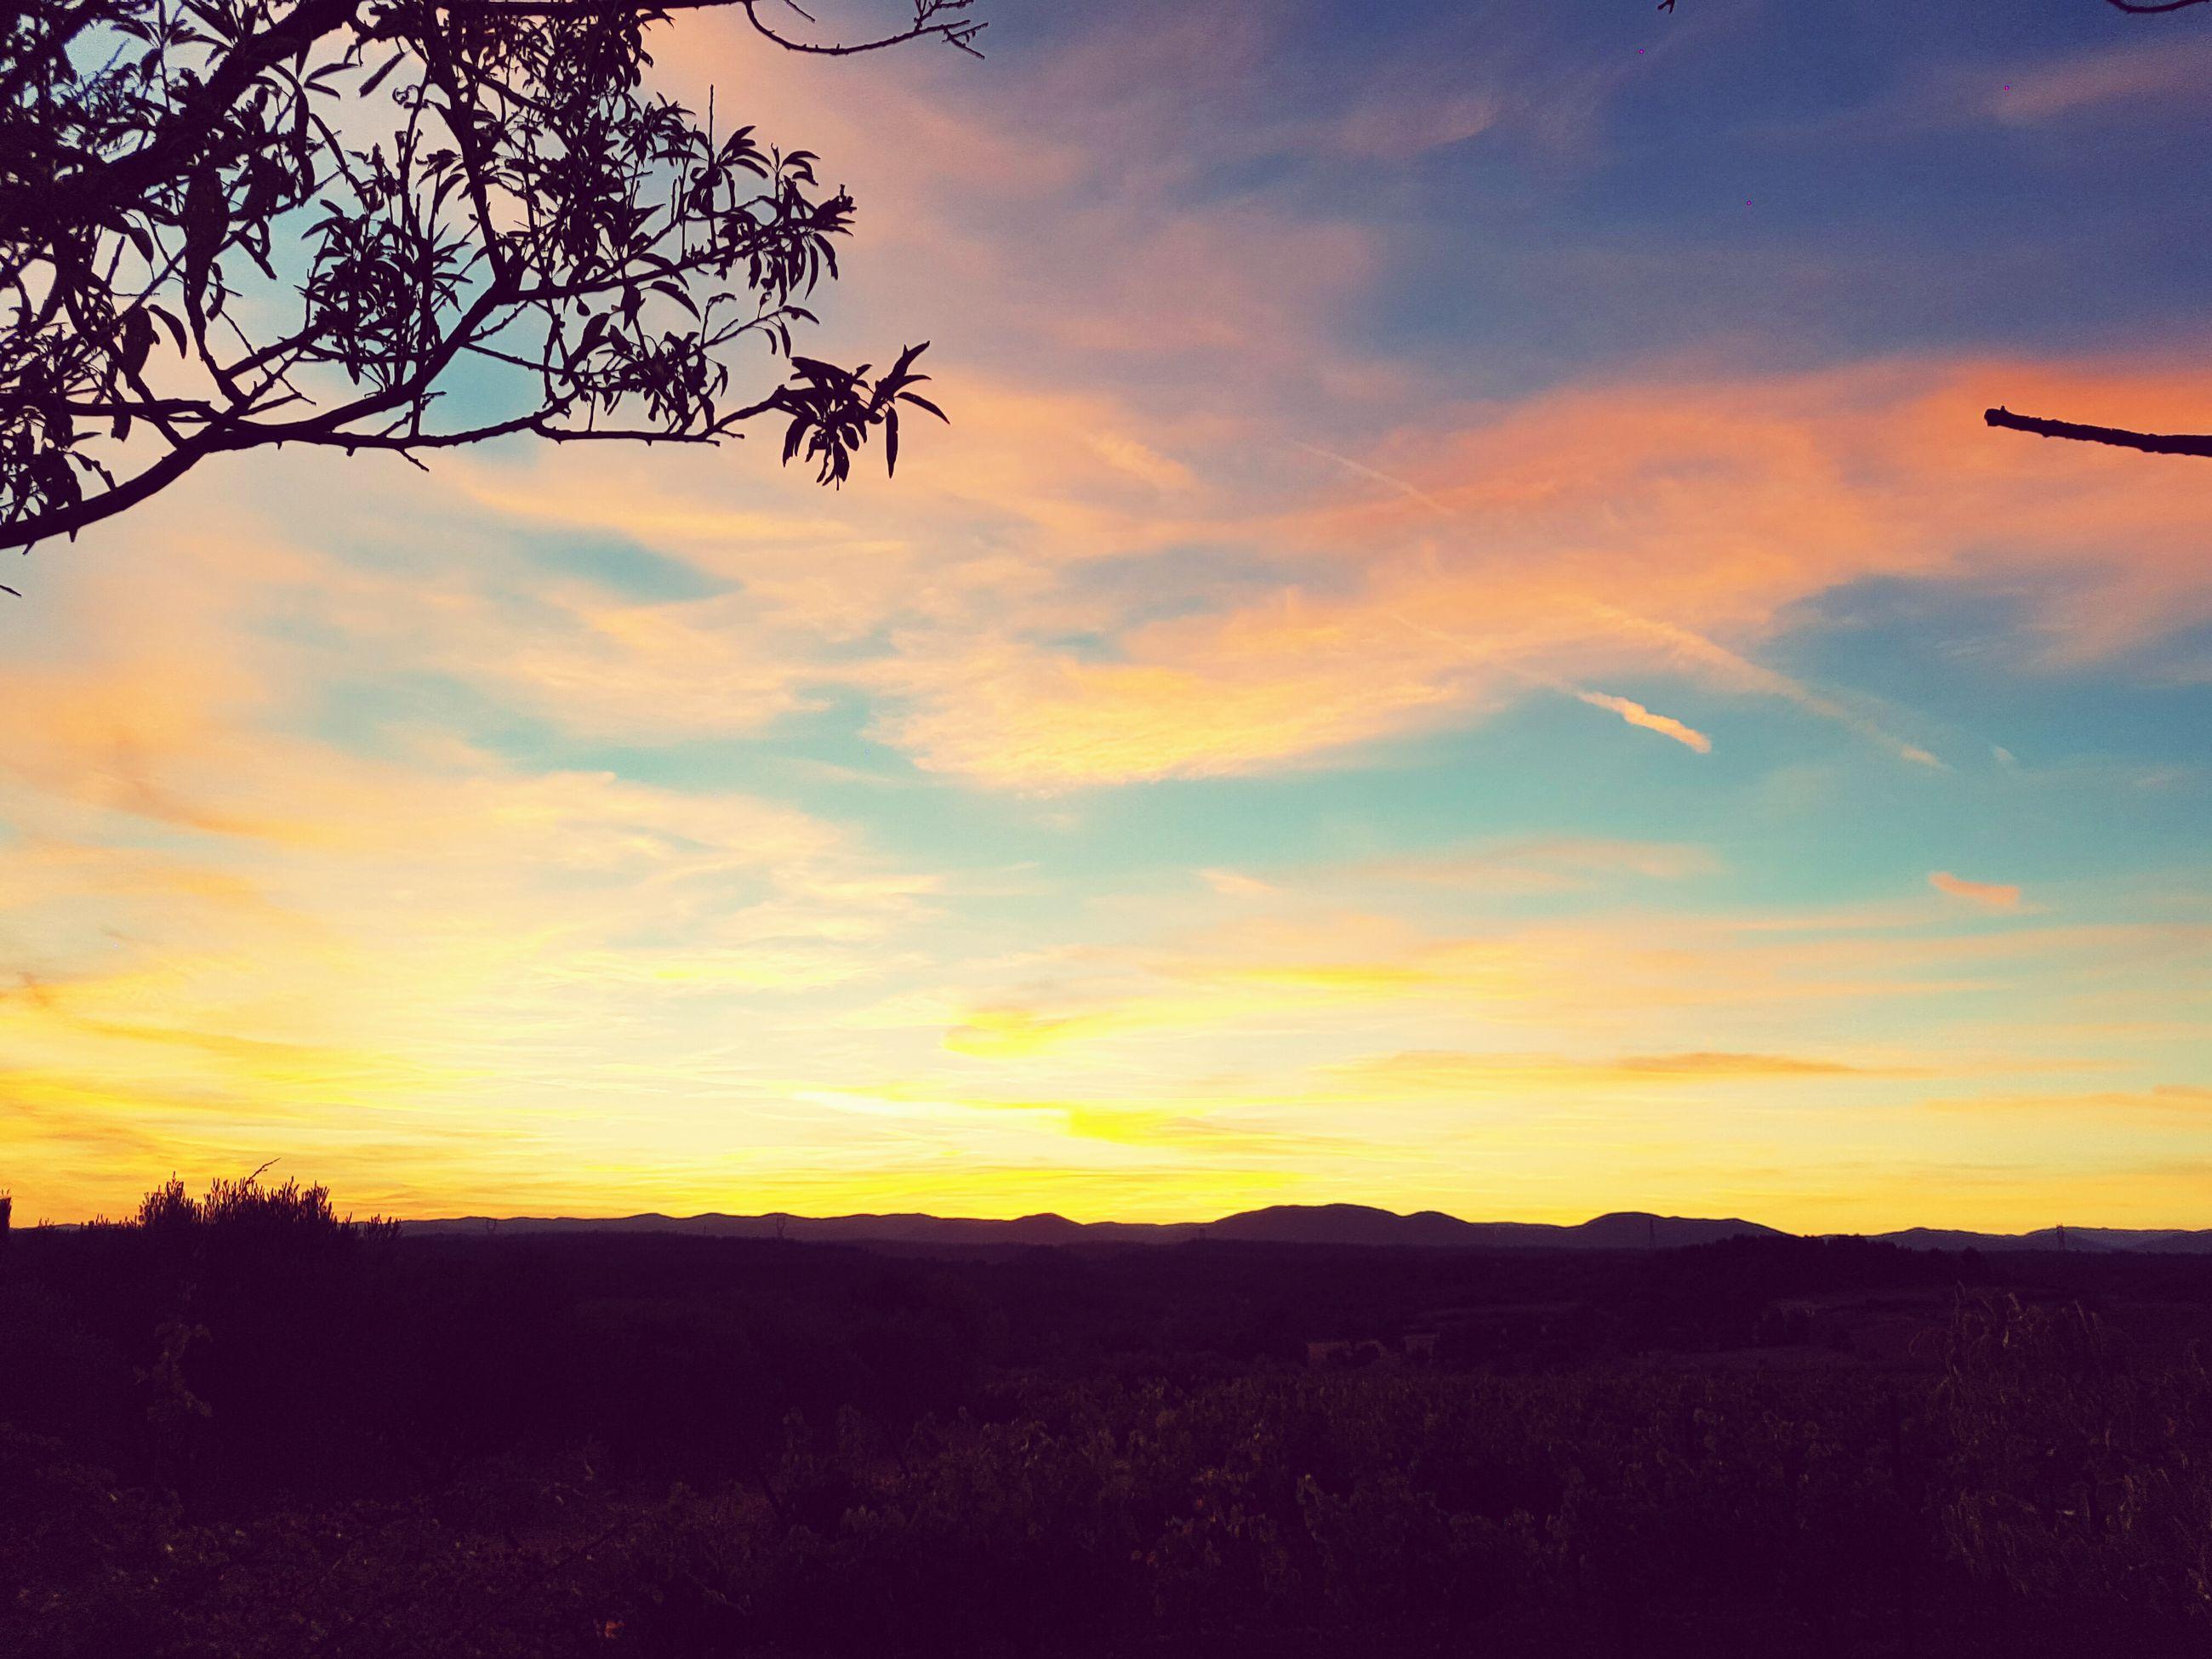 sunset, sky, tranquil scene, landscape, scenics, tranquility, beauty in nature, orange color, cloud - sky, nature, field, idyllic, tree, cloud, sun, horizon over land, rural scene, outdoors, non-urban scene, no people, non urban scene, dramatic sky, remote, cloudy, majestic, growth